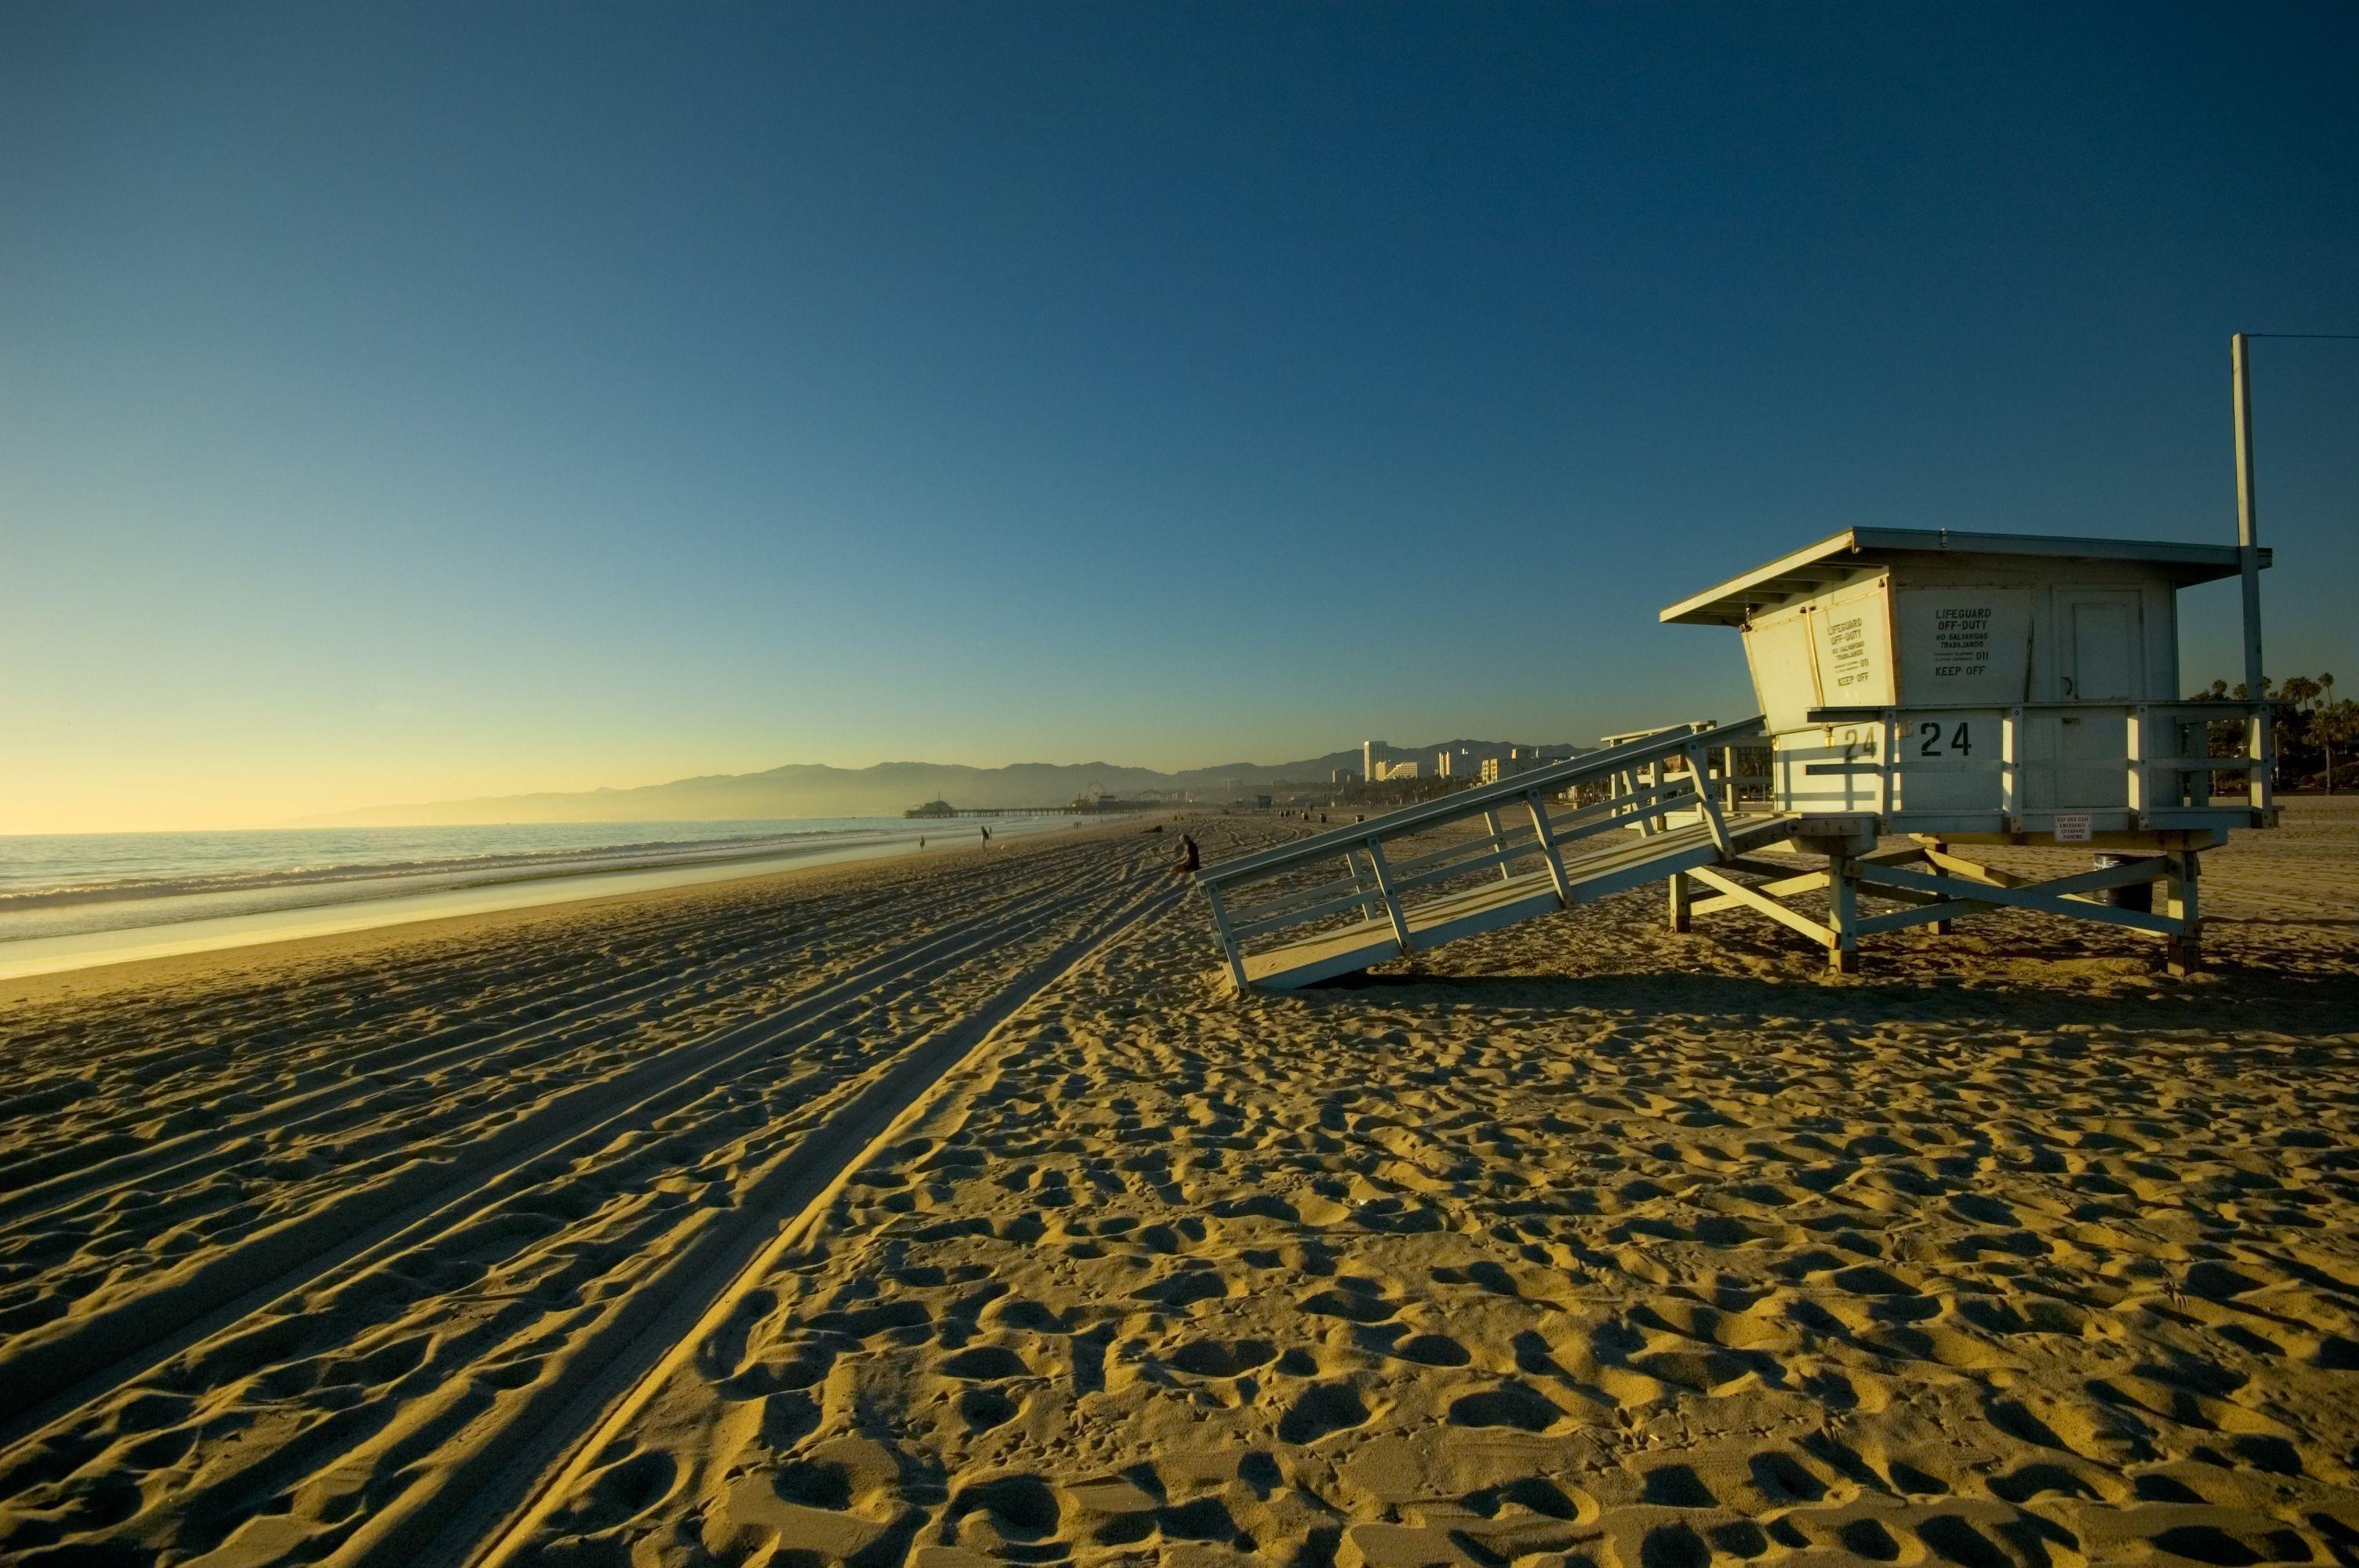 Venice Beach Wallpapers Top Free Venice Beach Backgrounds Wallpaperaccess